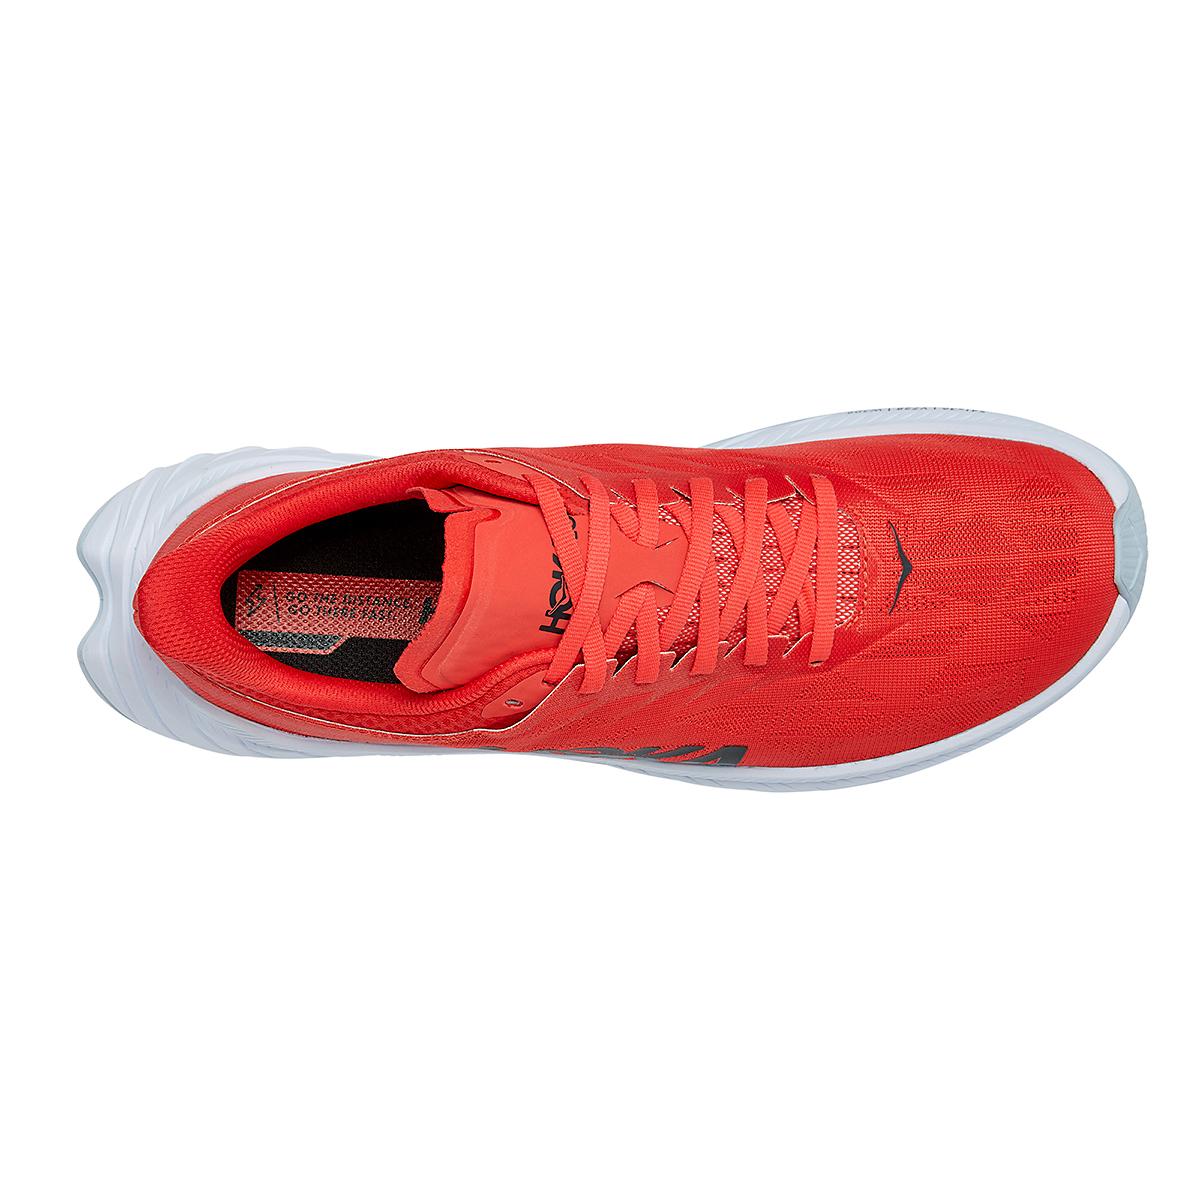 Men's Hoka One One Carbon X 2 Running Shoe - Color: Fiesta/White - Size: 9 - Width: Regular, Fiesta/White, large, image 5